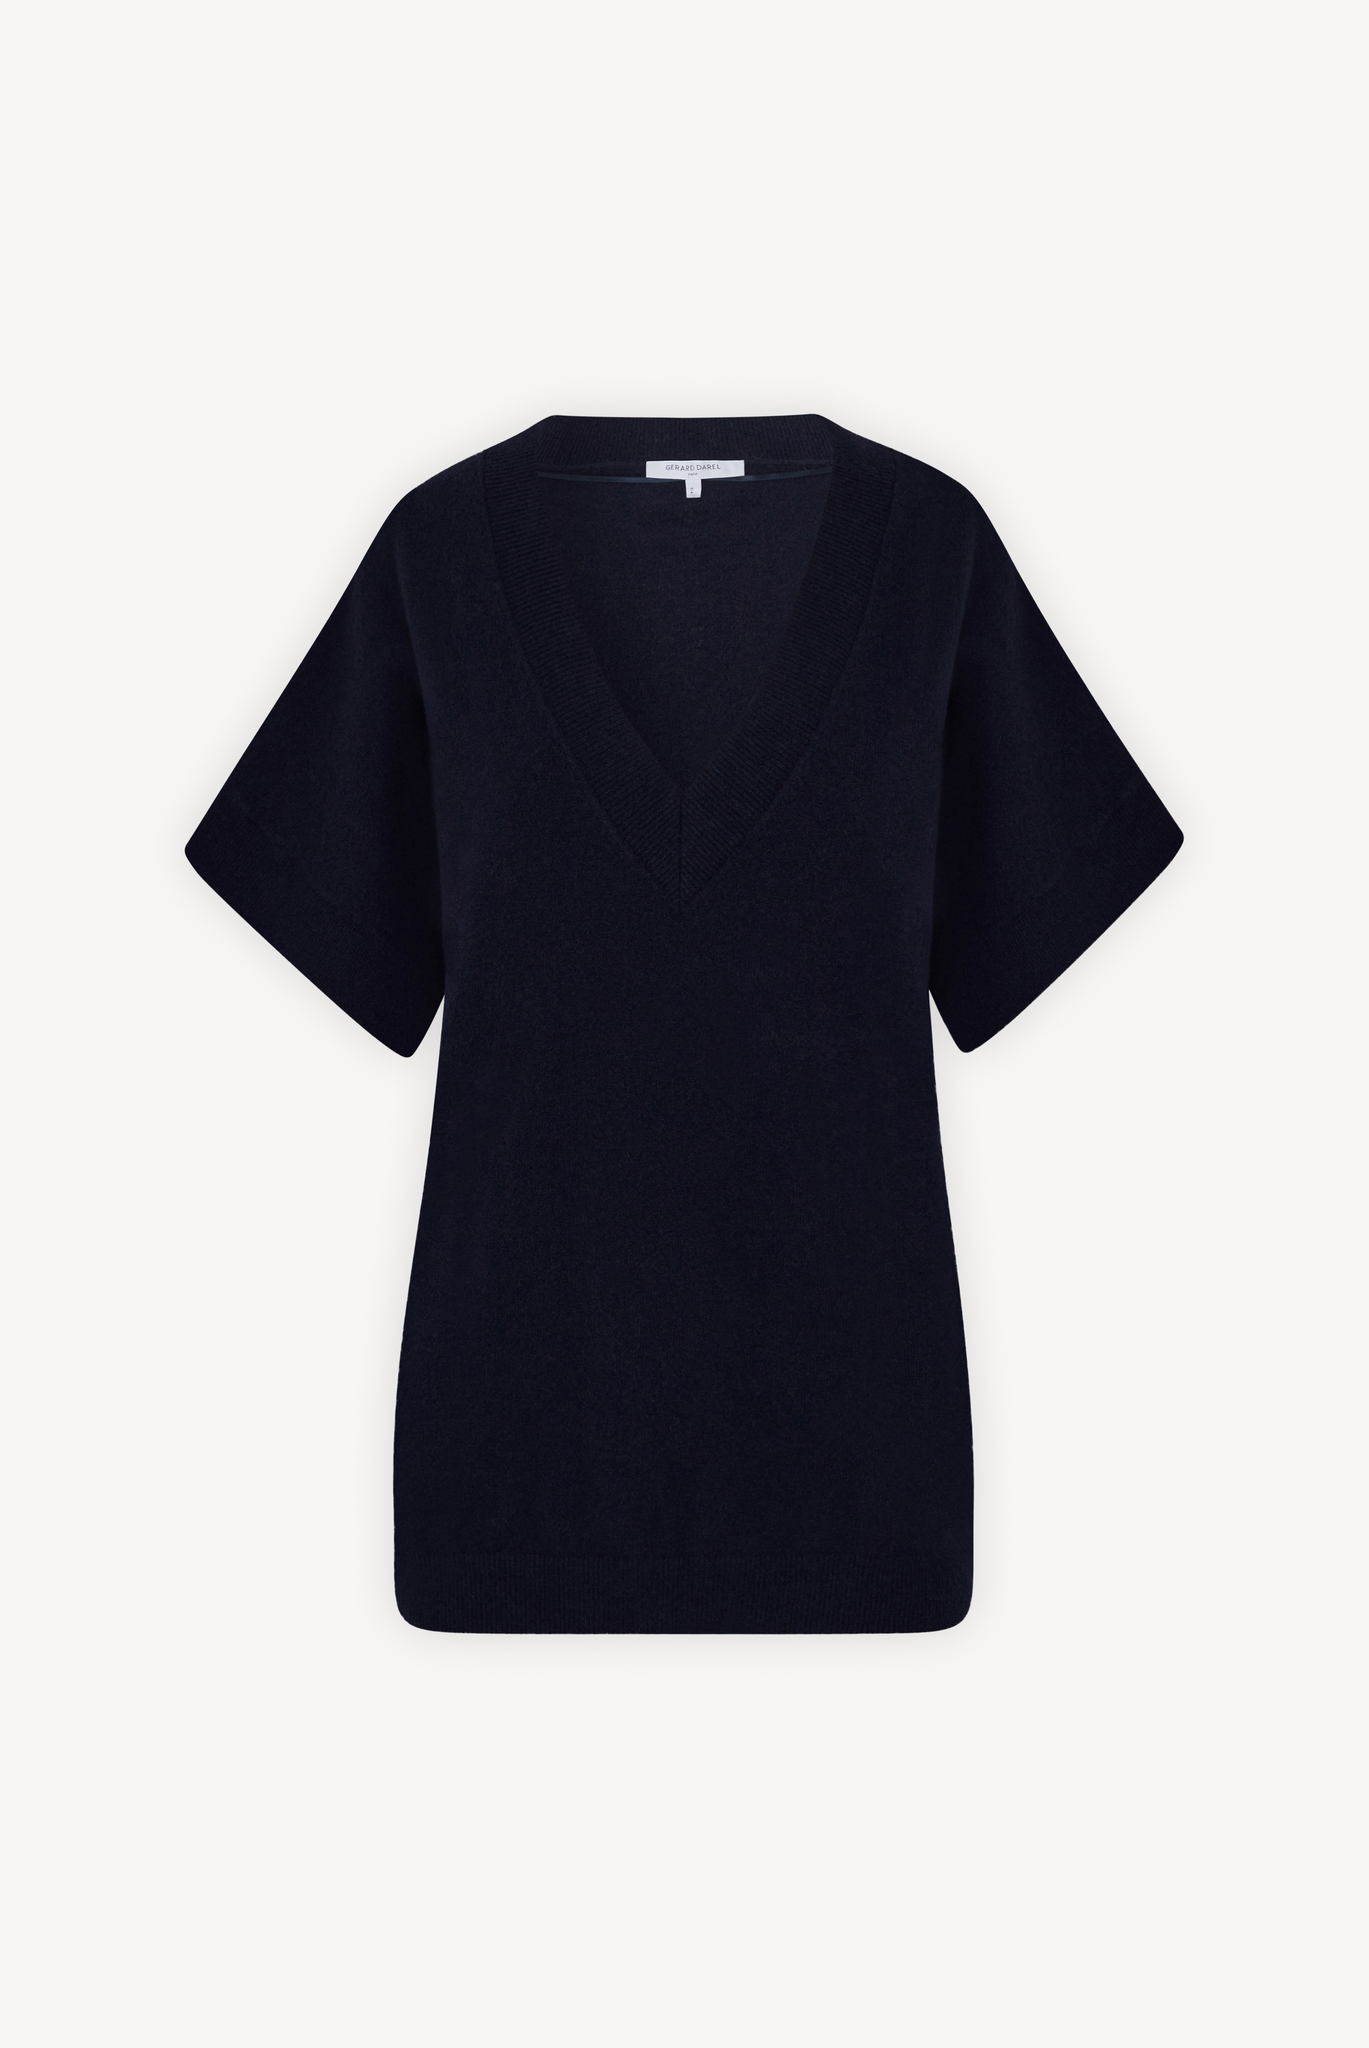 LAIA - Оверсайз пуловер с короткими рукавами